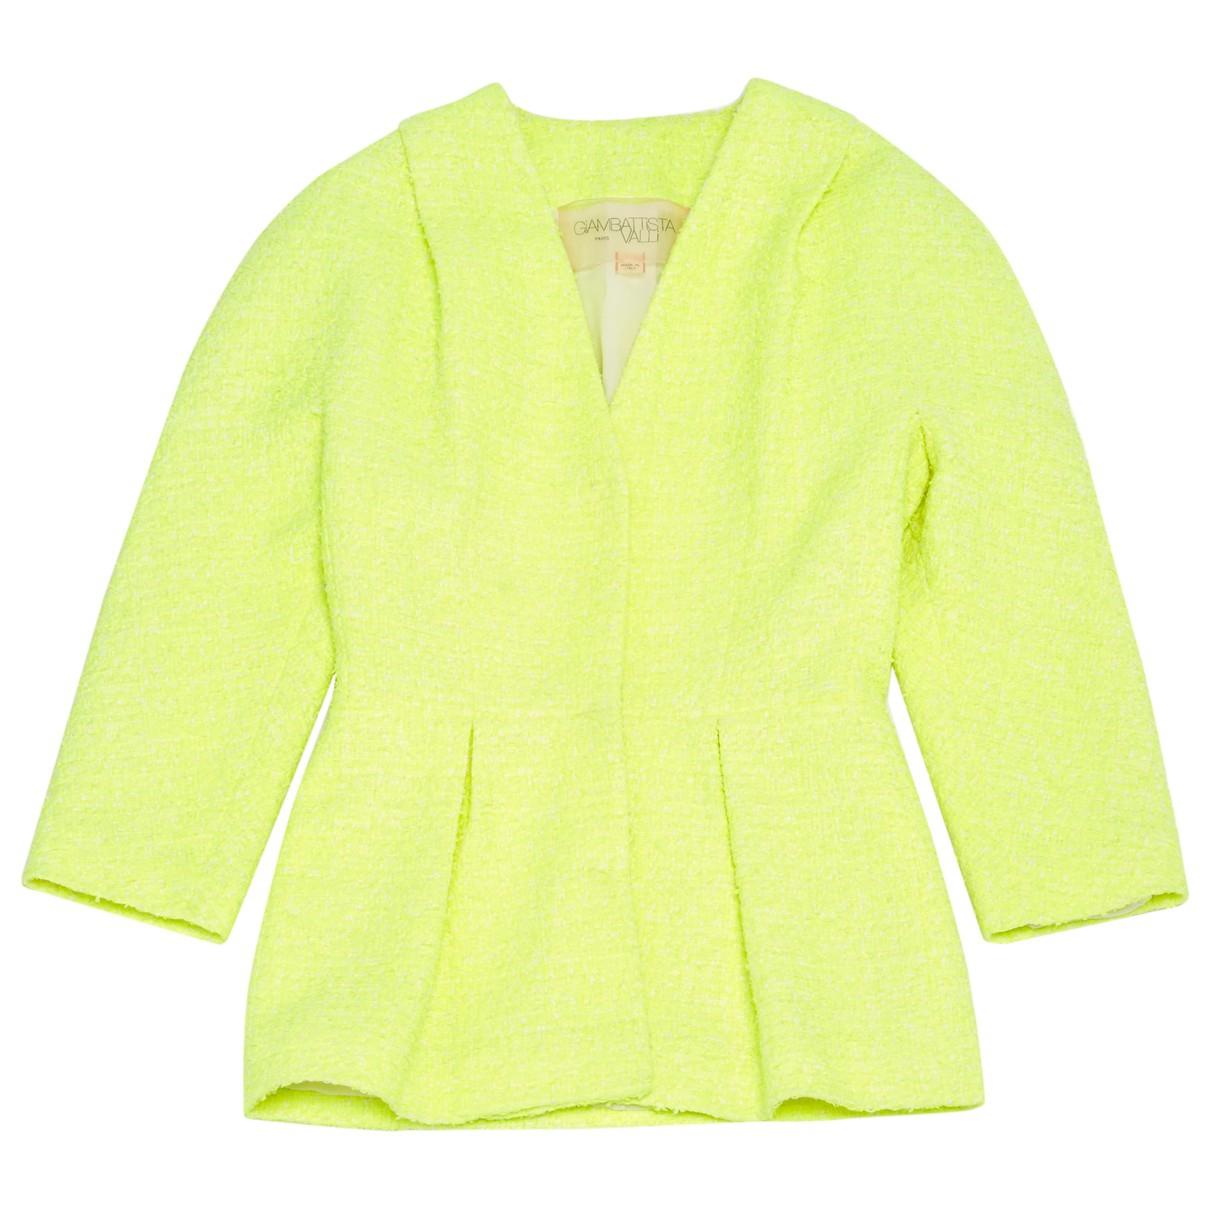 Giambattista Valli \N Yellow jacket for Women XS International